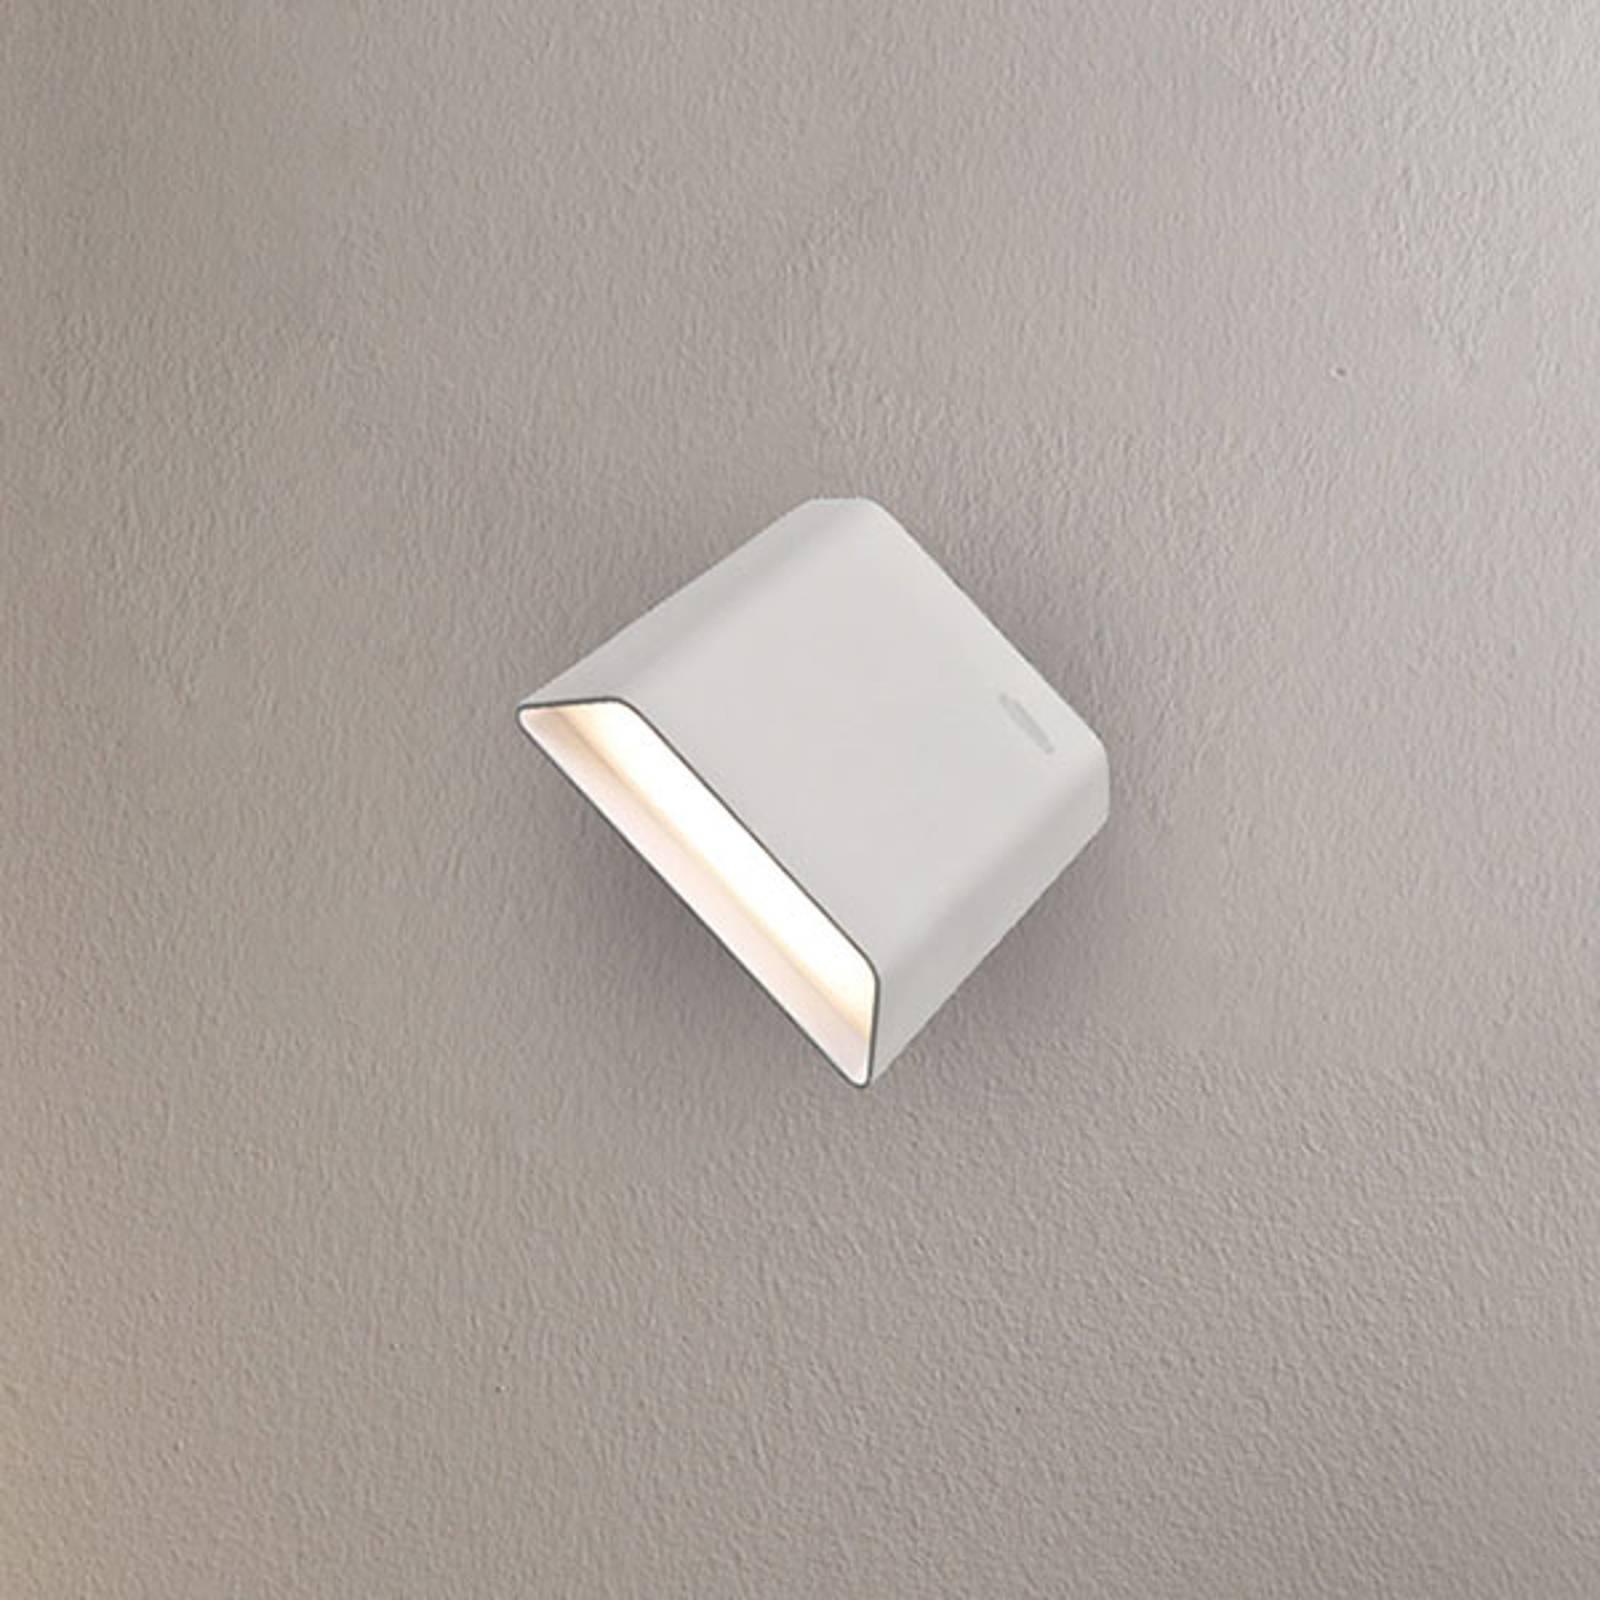 Applique LED Biak, pivotante/basculante, blanche